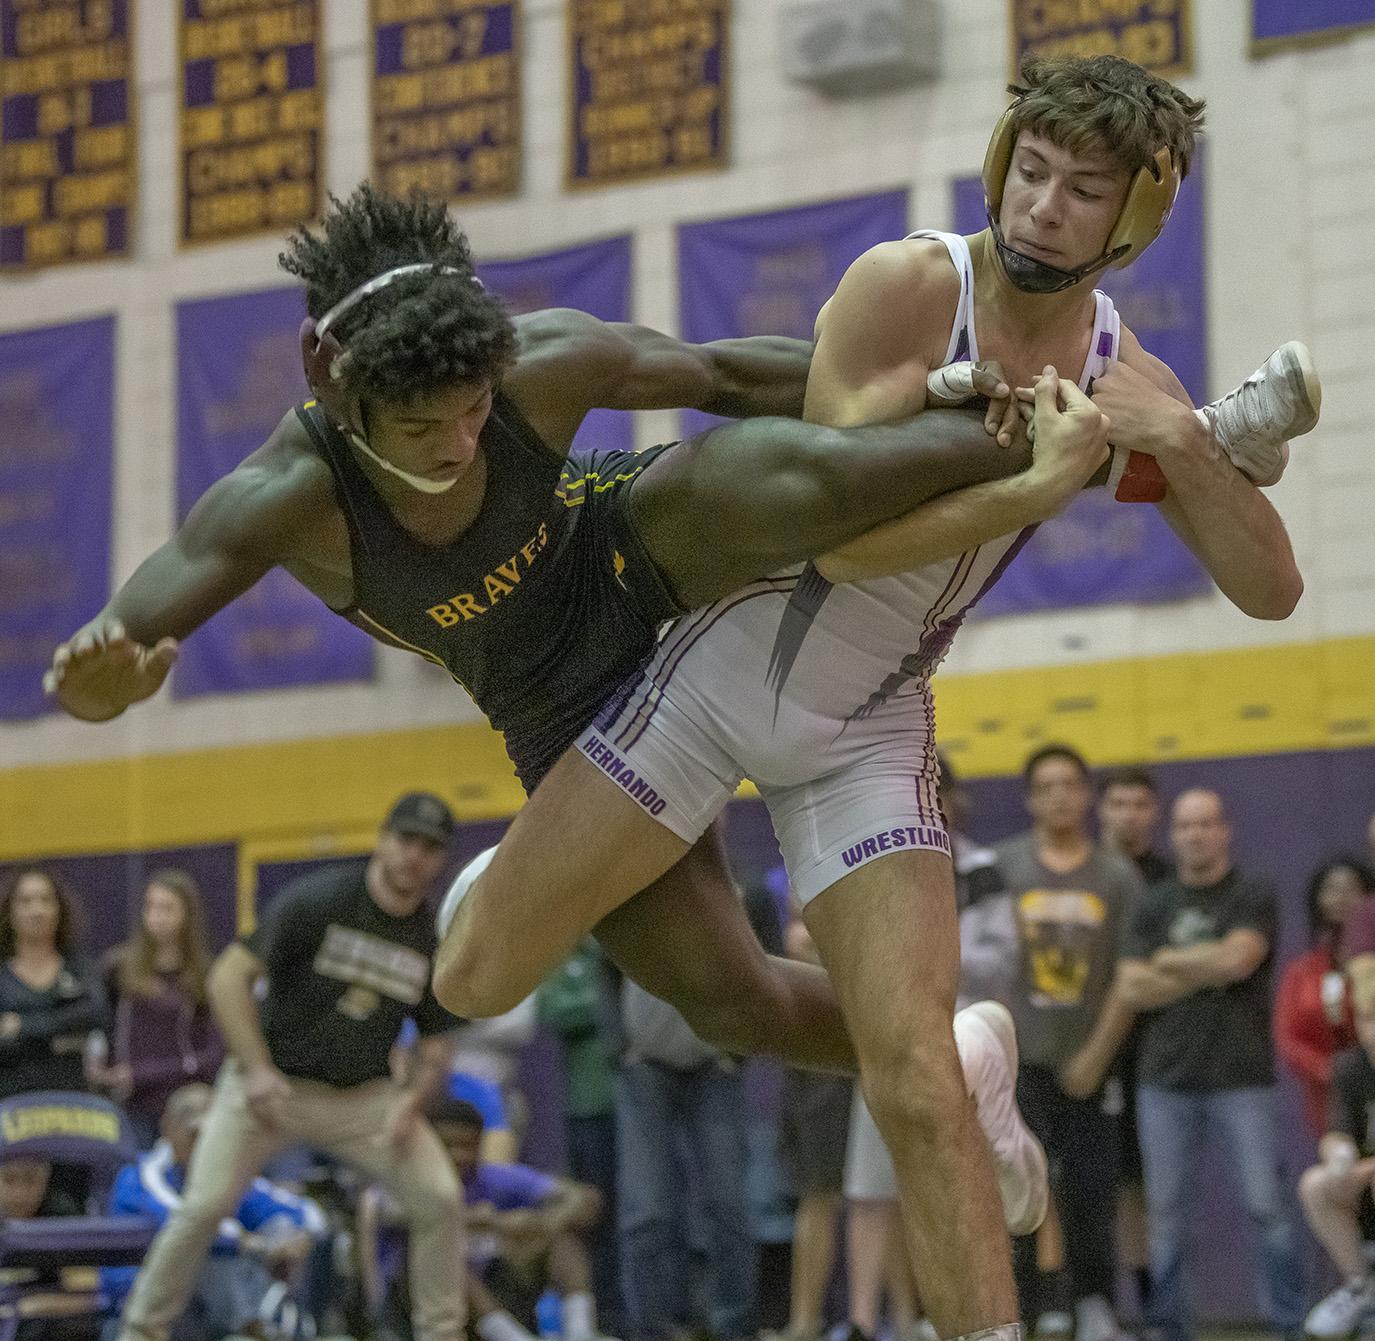 Purple vs. Gold Night in Wrestling